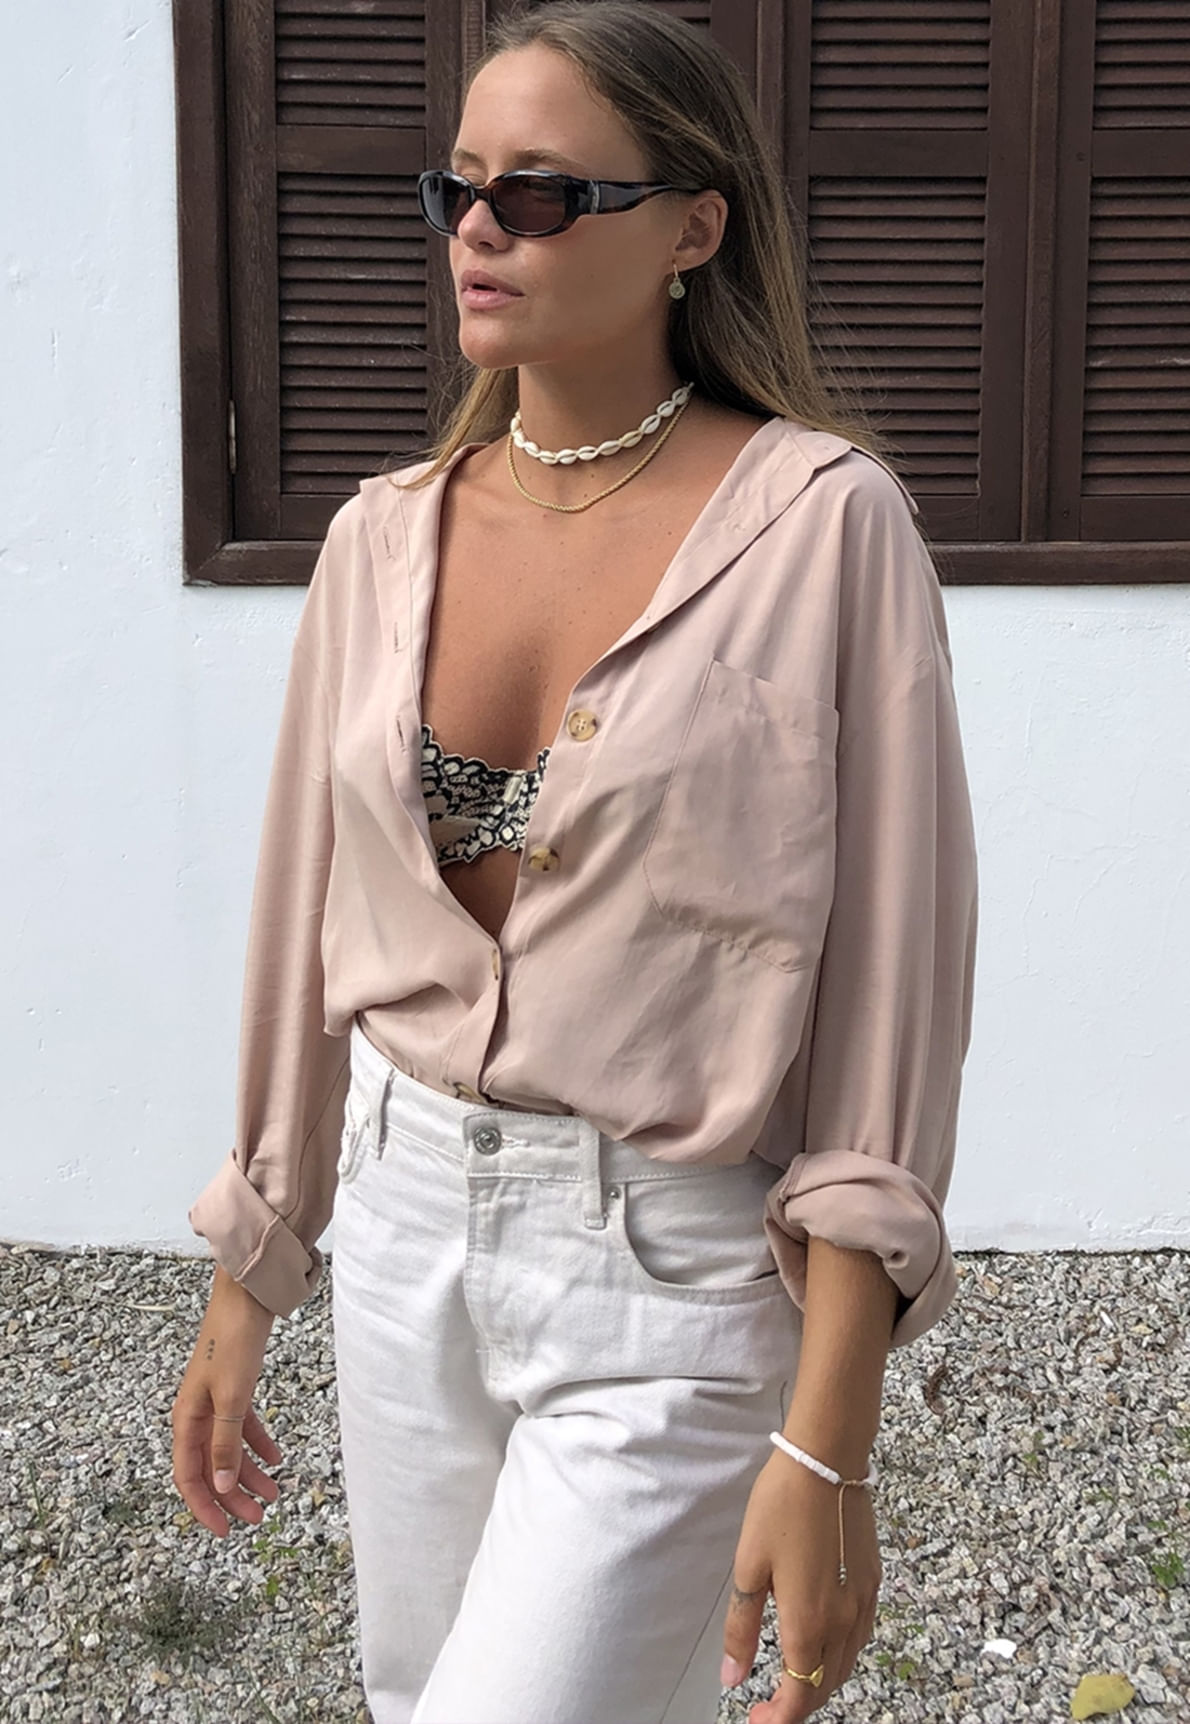 29429-chemise-rose-karolyn-mundo-lolita-03